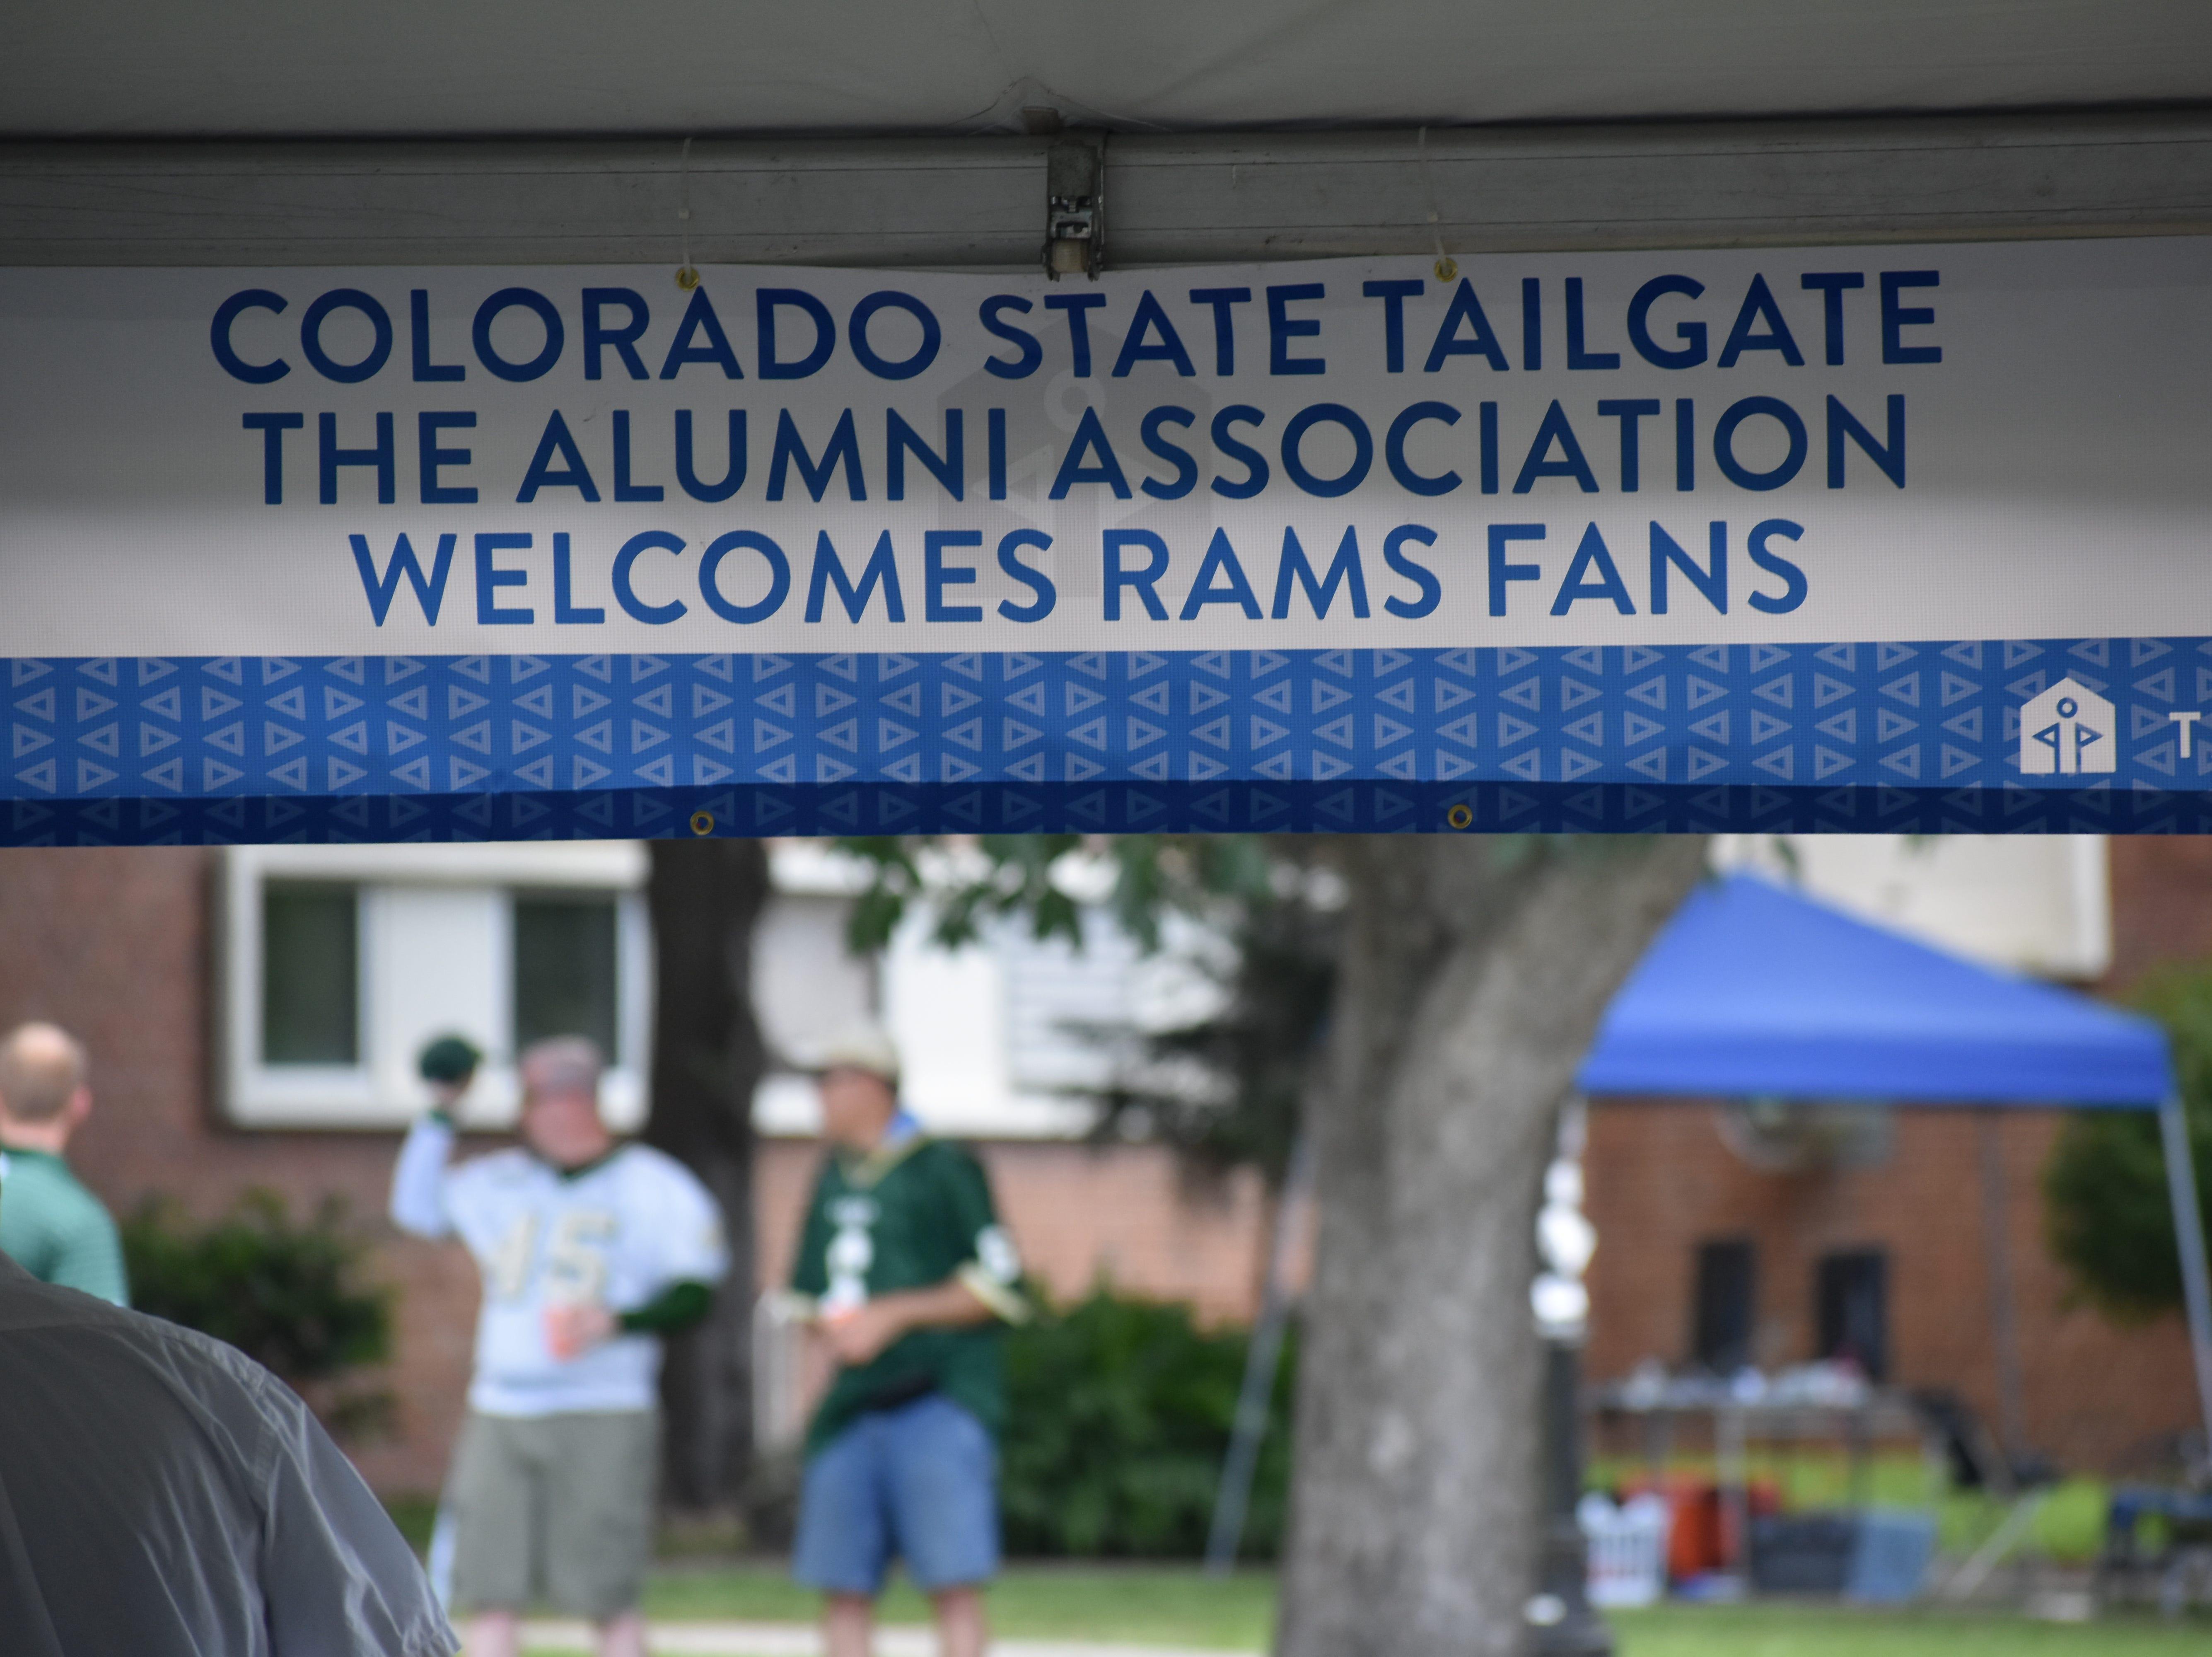 The CSU alumni association tailgate outside Ben Hill Griffin Stadium.